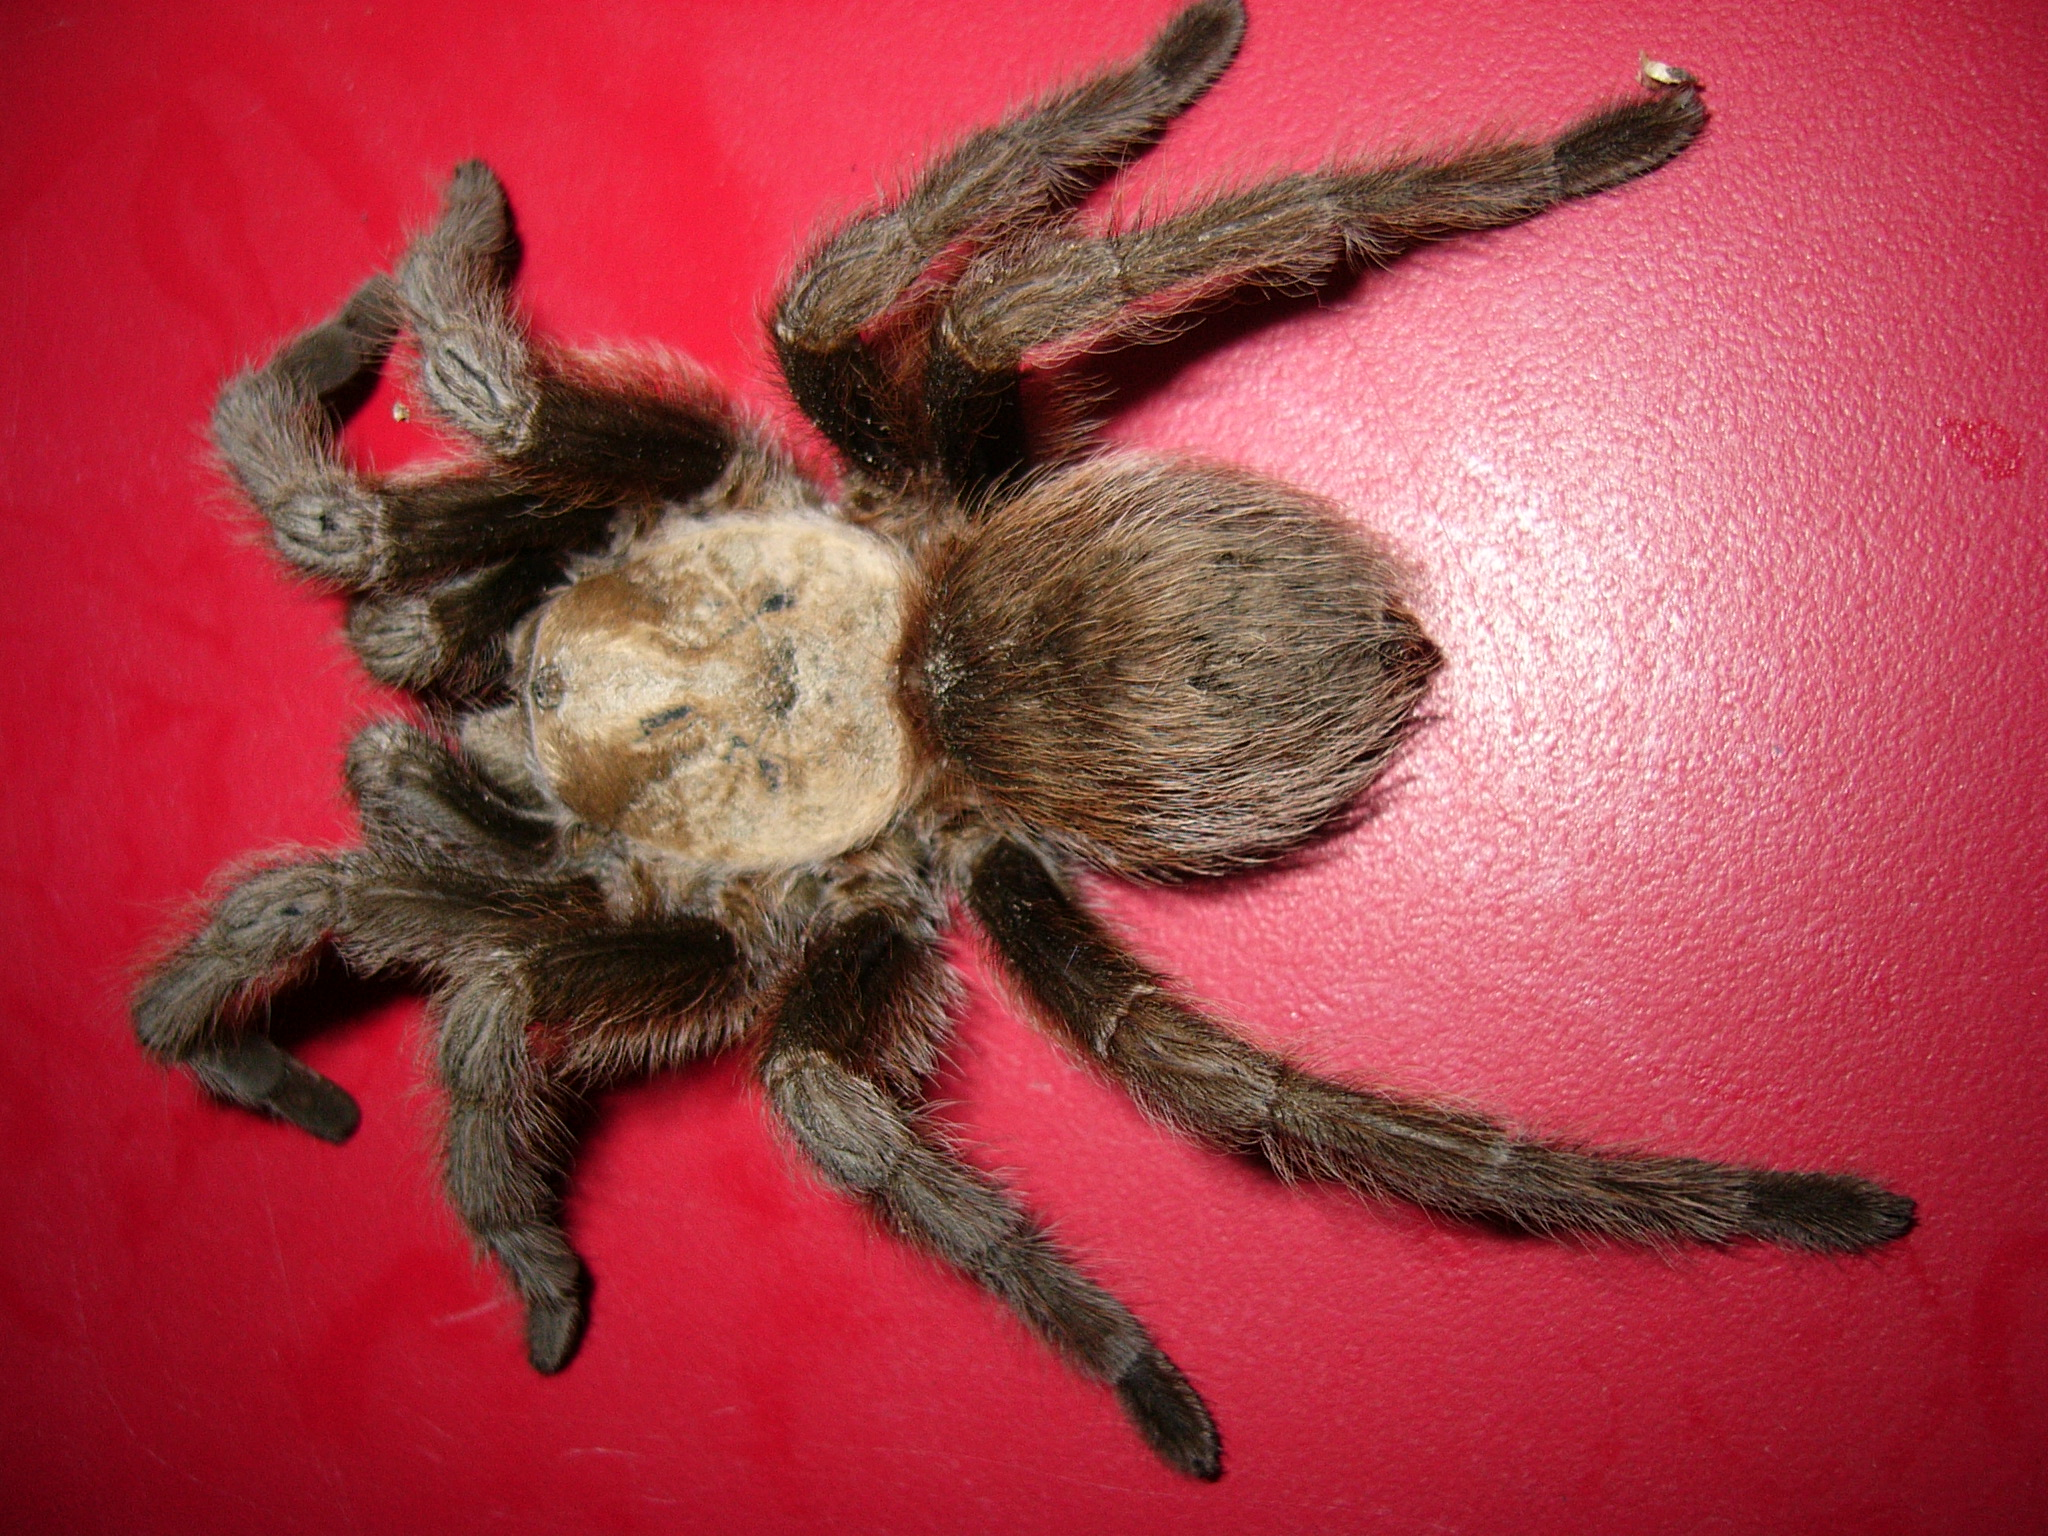 Large hairy spider photo